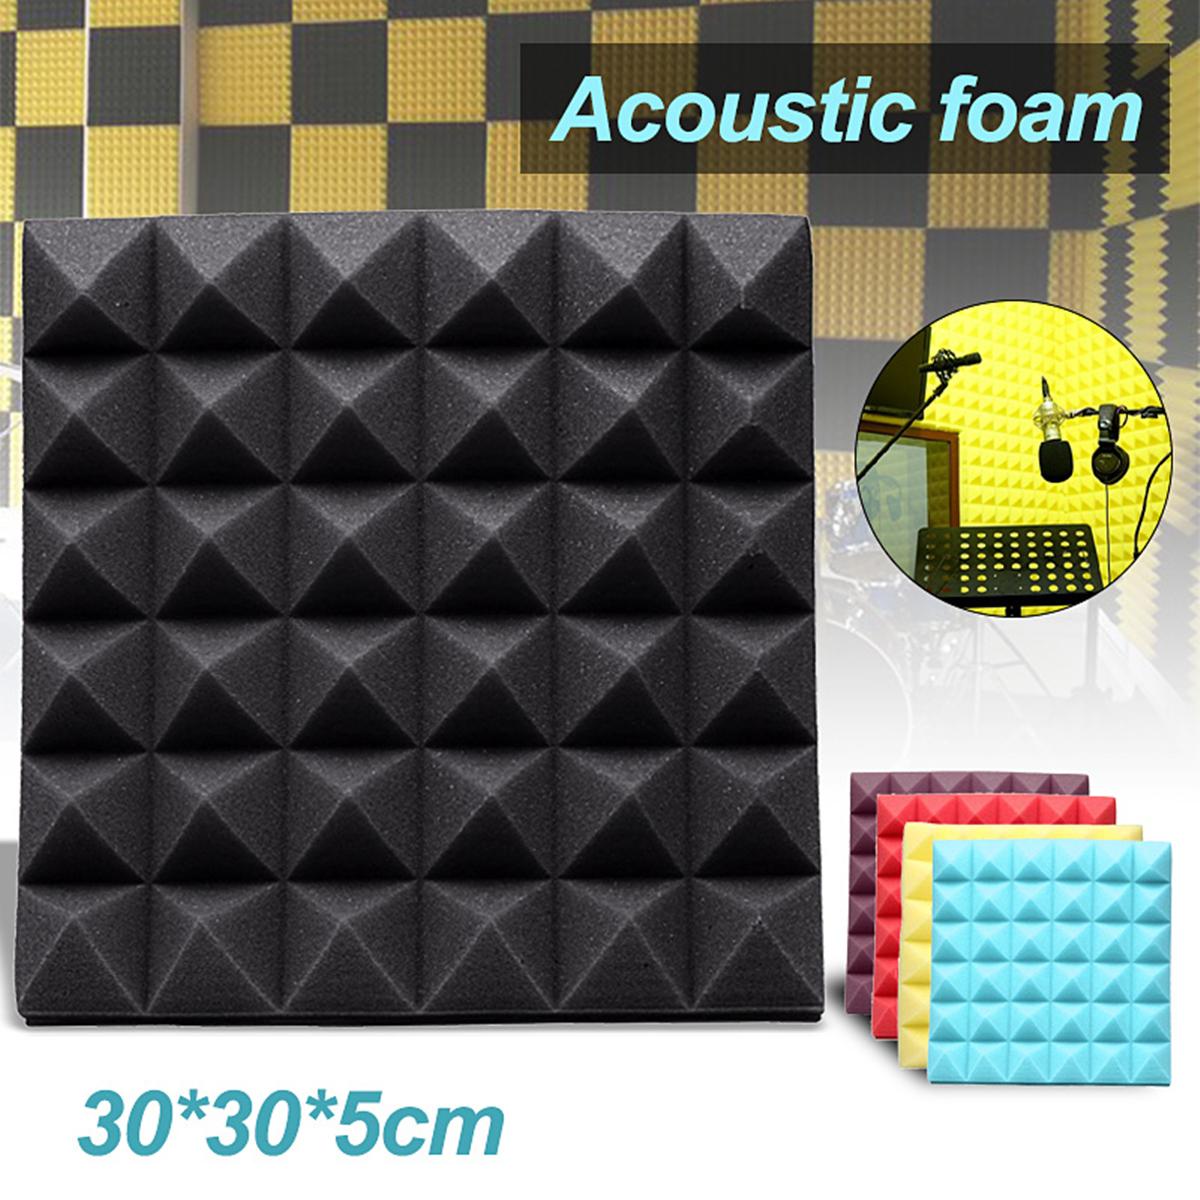 "1Pcs 2""x12""x12""Acoustic Foam Panels Studio Soundproofing Treatment Absorption Panel Tile Wedge Sponge for Studio/Drum Room/KTV"